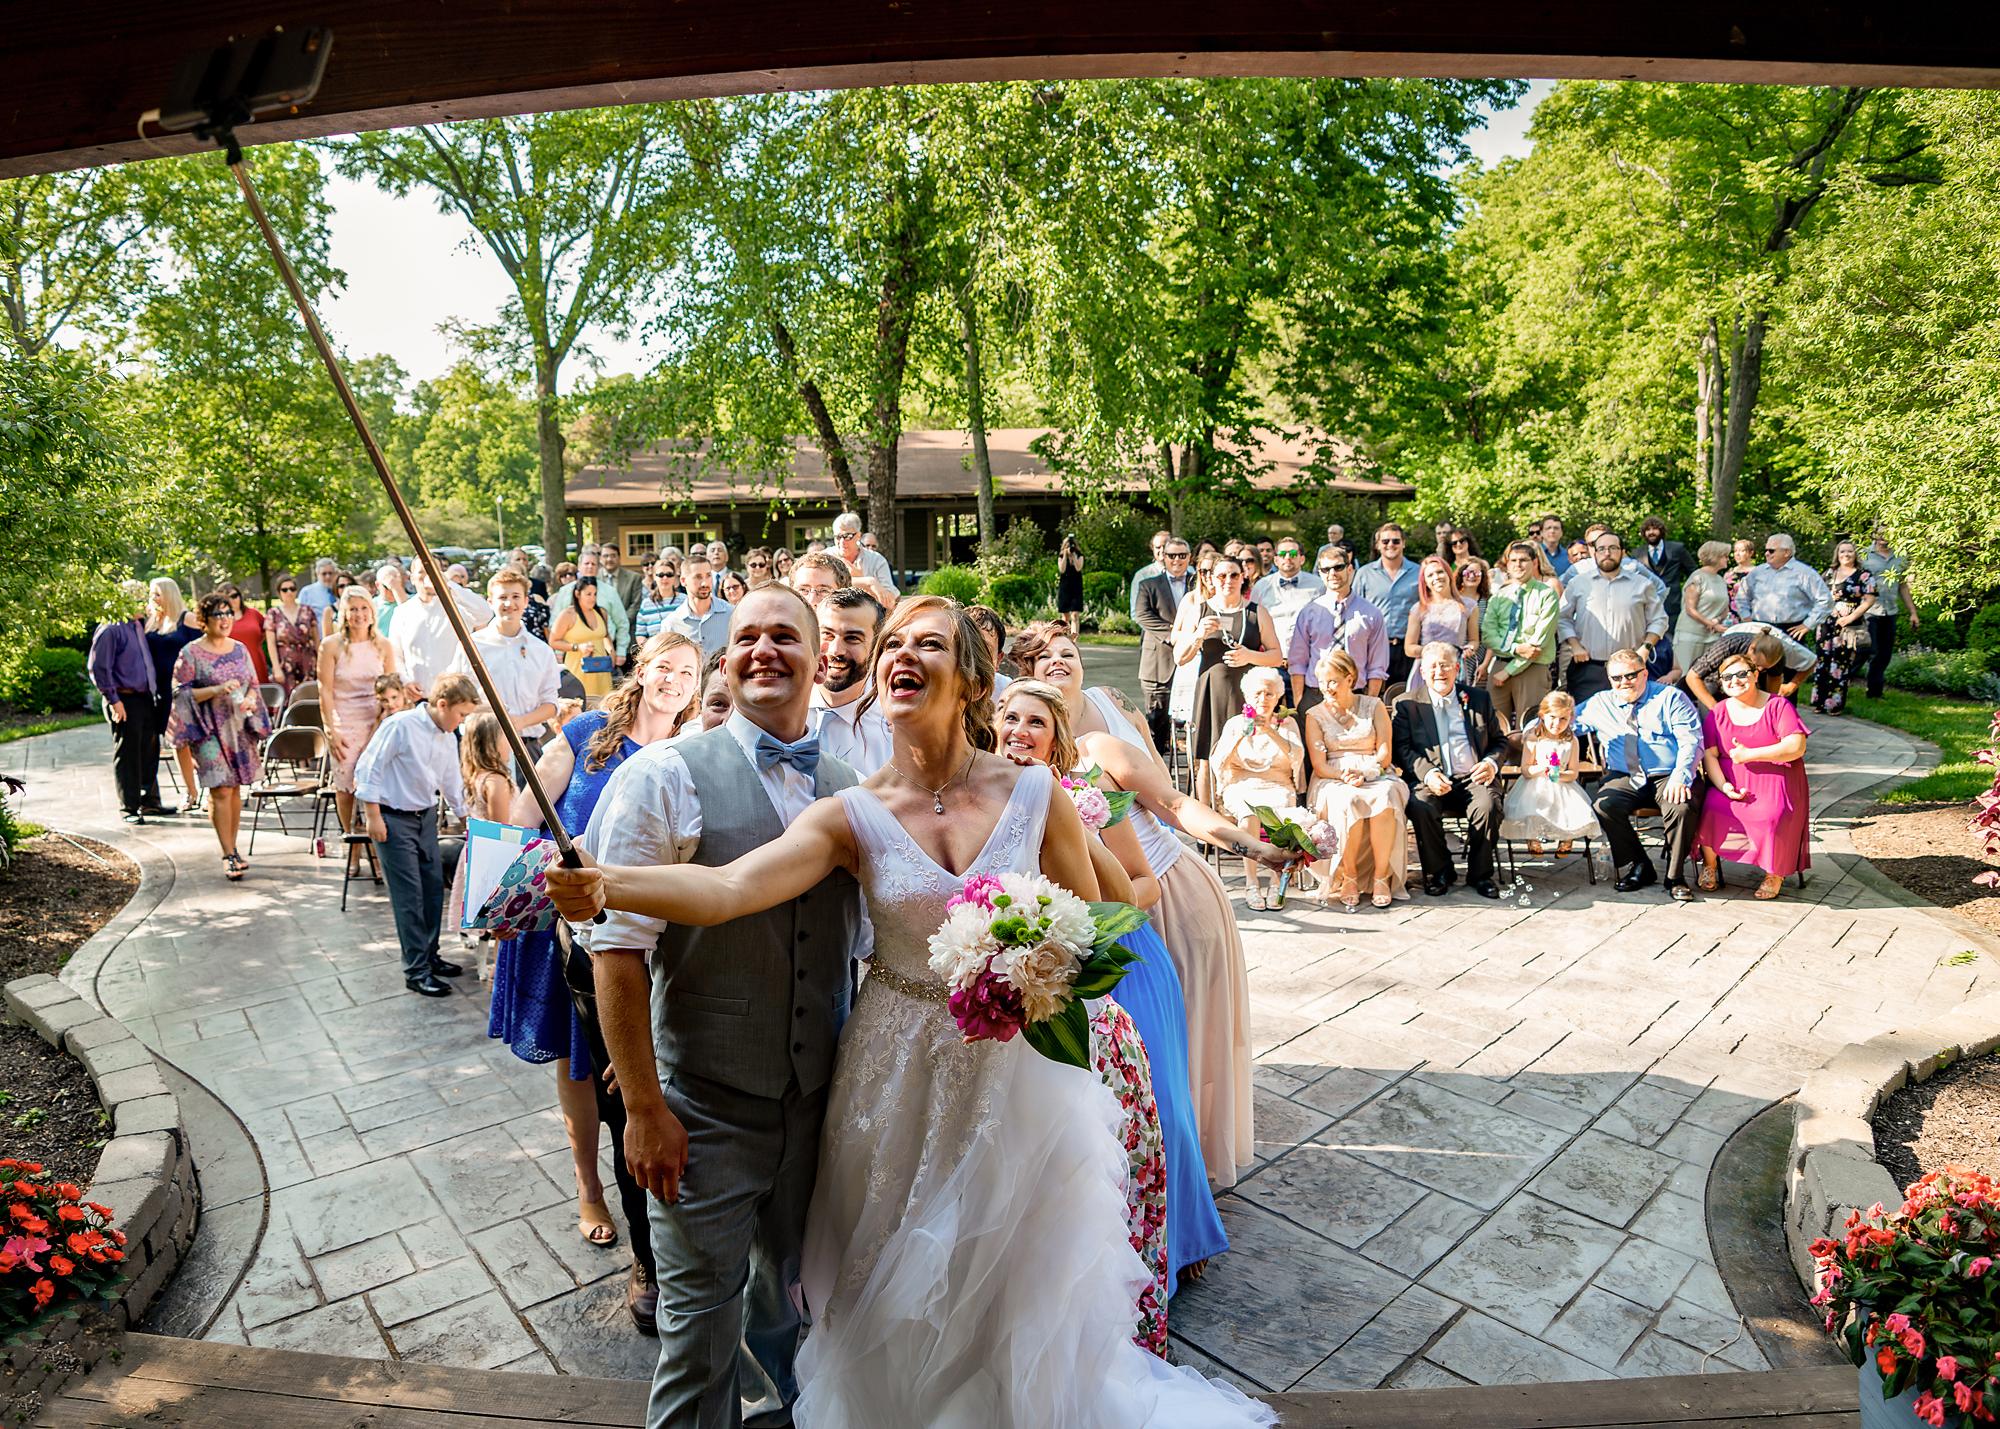 Pattison-Park-Lodge-Wedding-Cincinnati-Ohio-Photographer-23.jpg